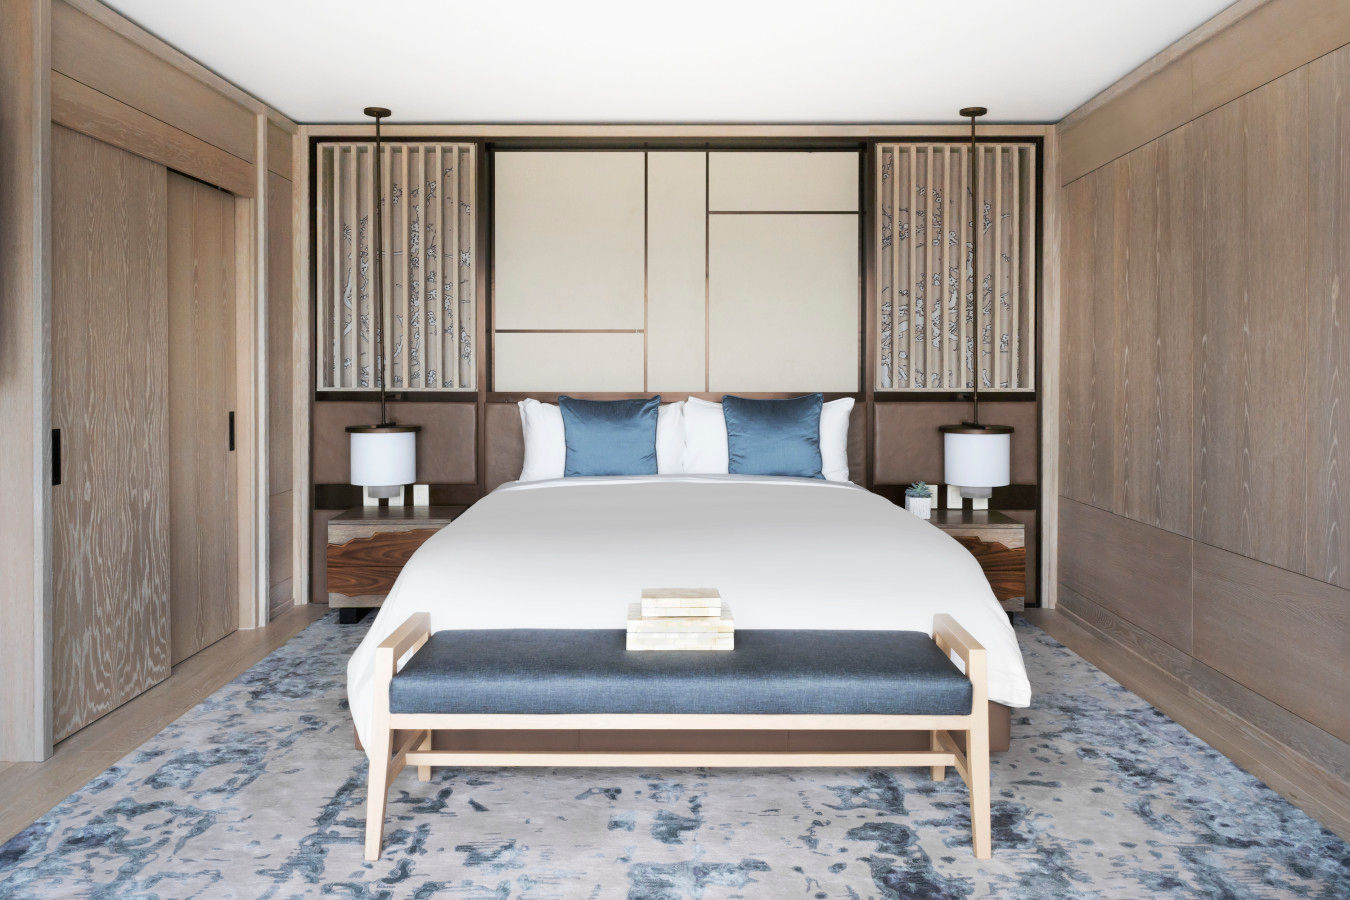 Yuhi Villa - Nobu HotelMiami Beach